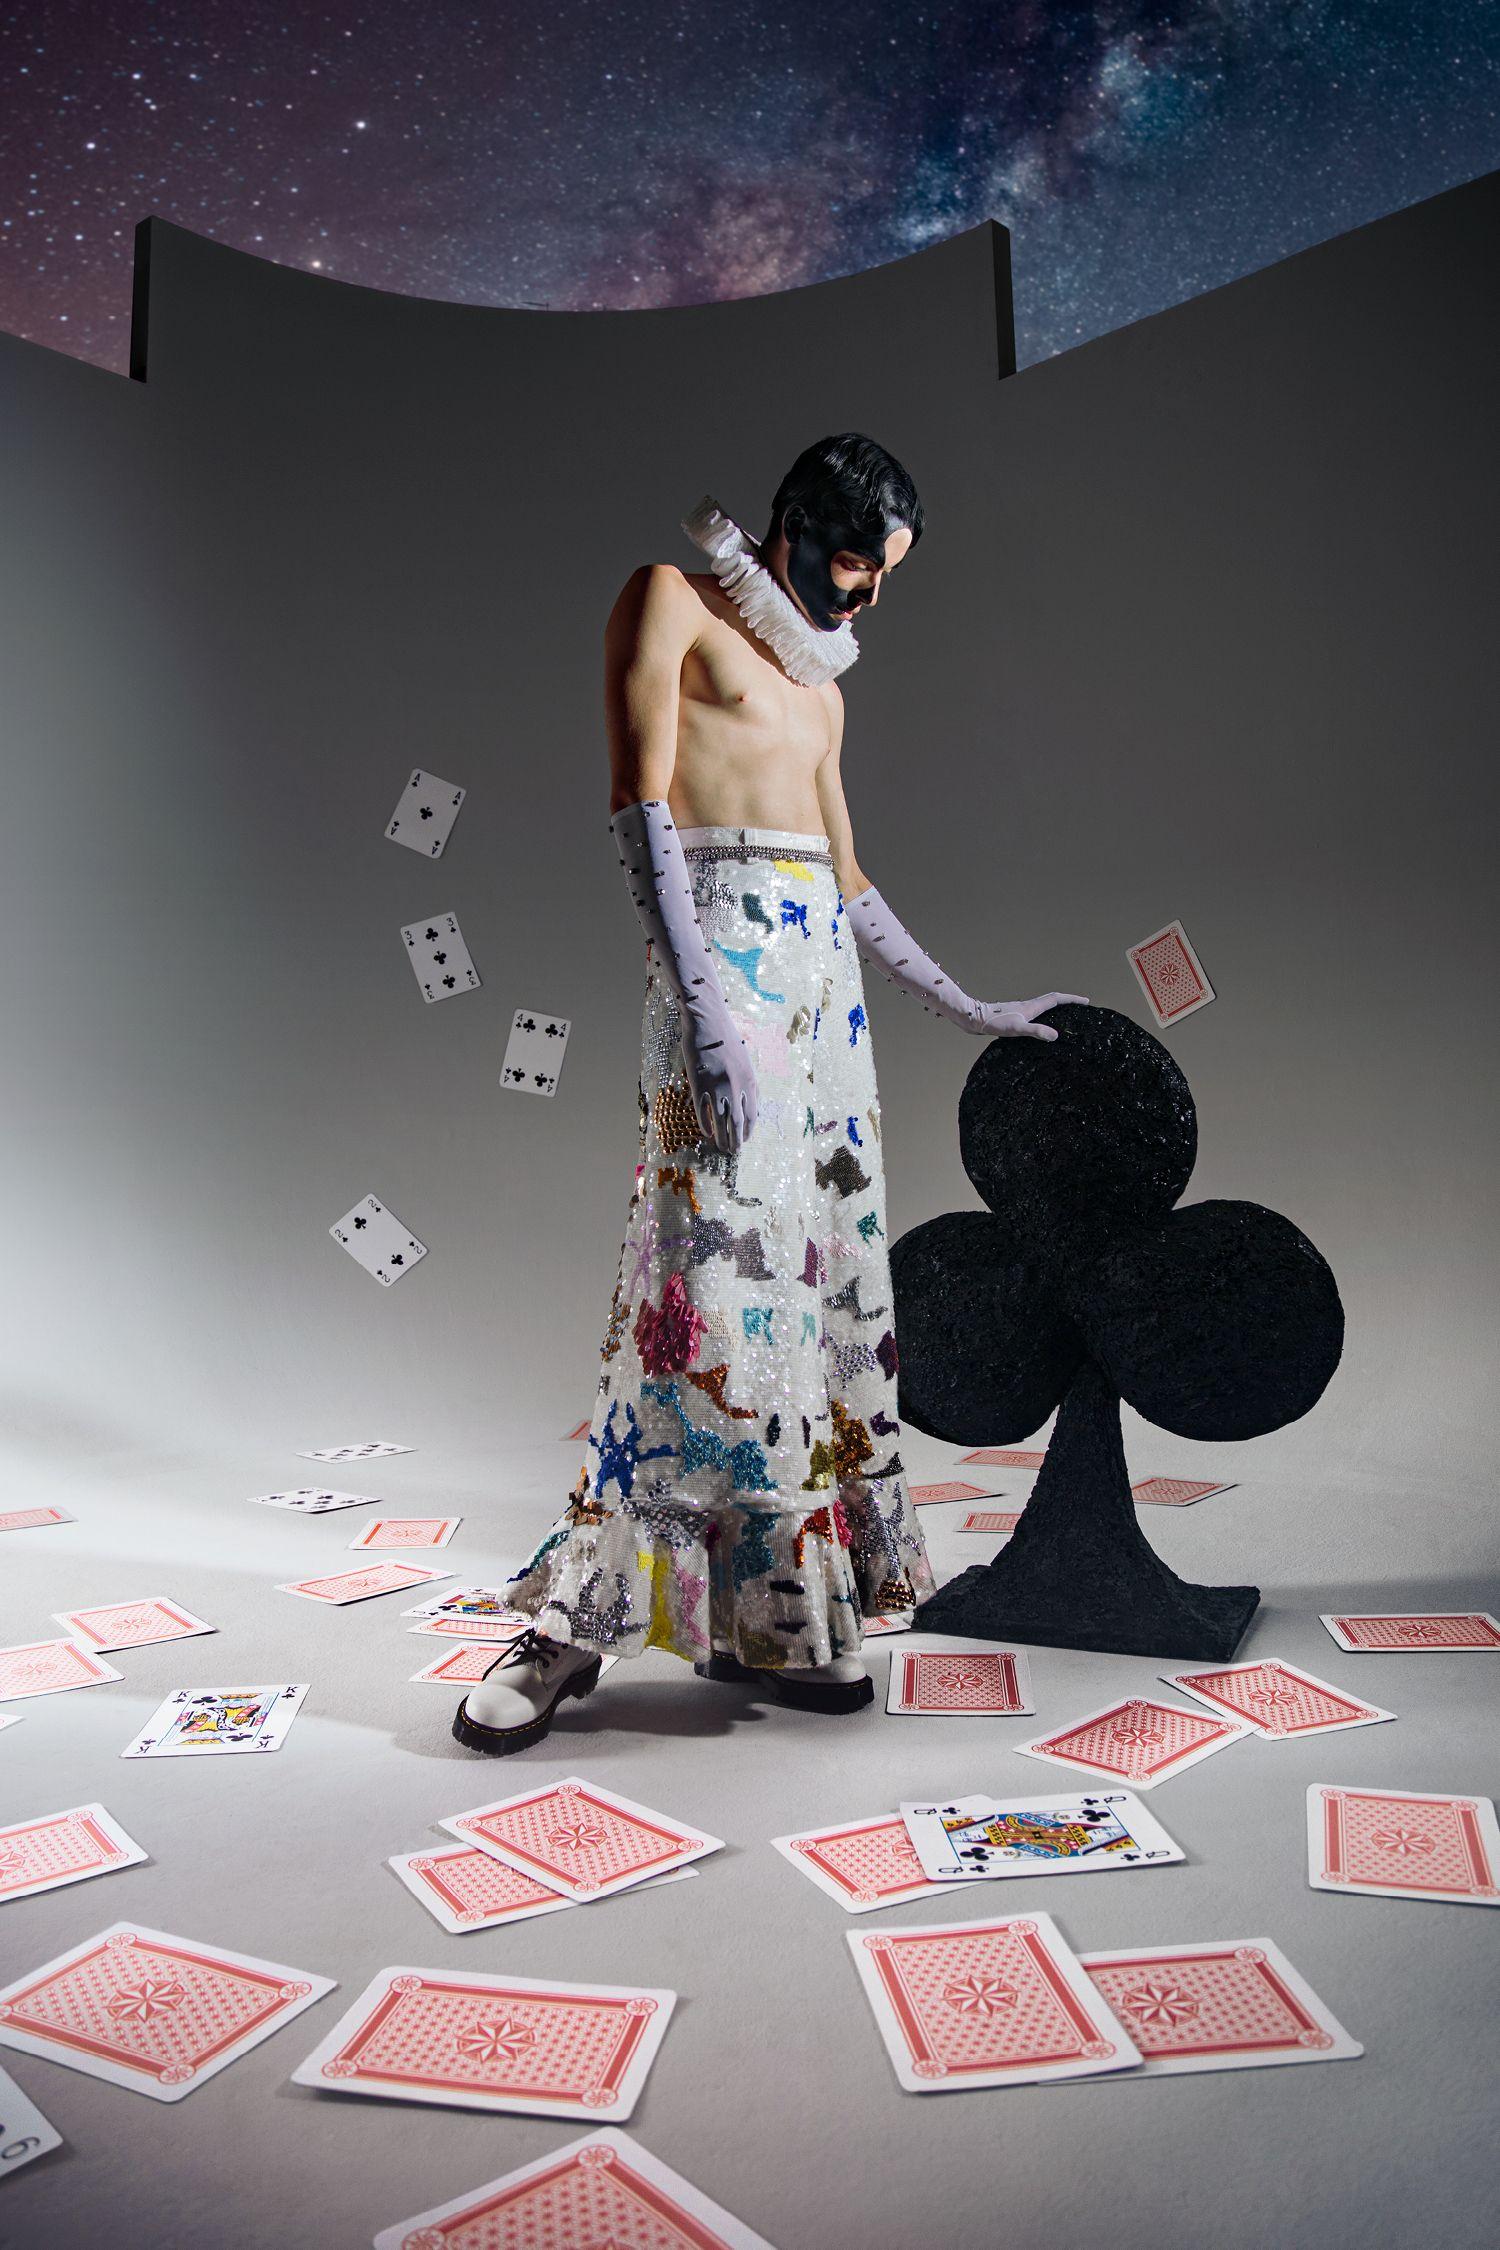 KIMDARY Fashion photographer and Art Director